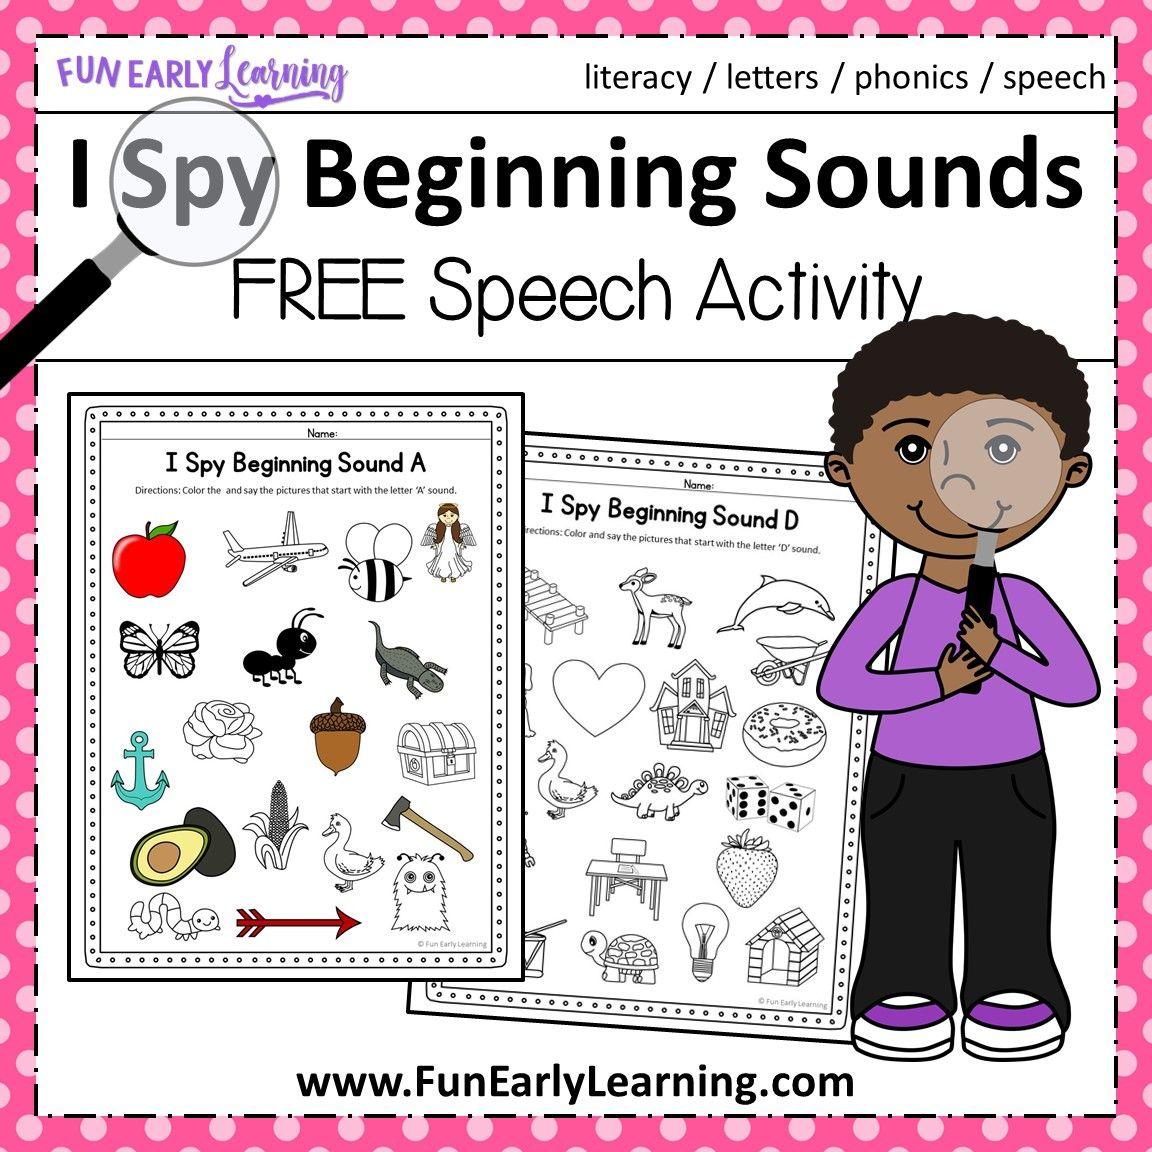 I Spy Beginning Sounds Activity